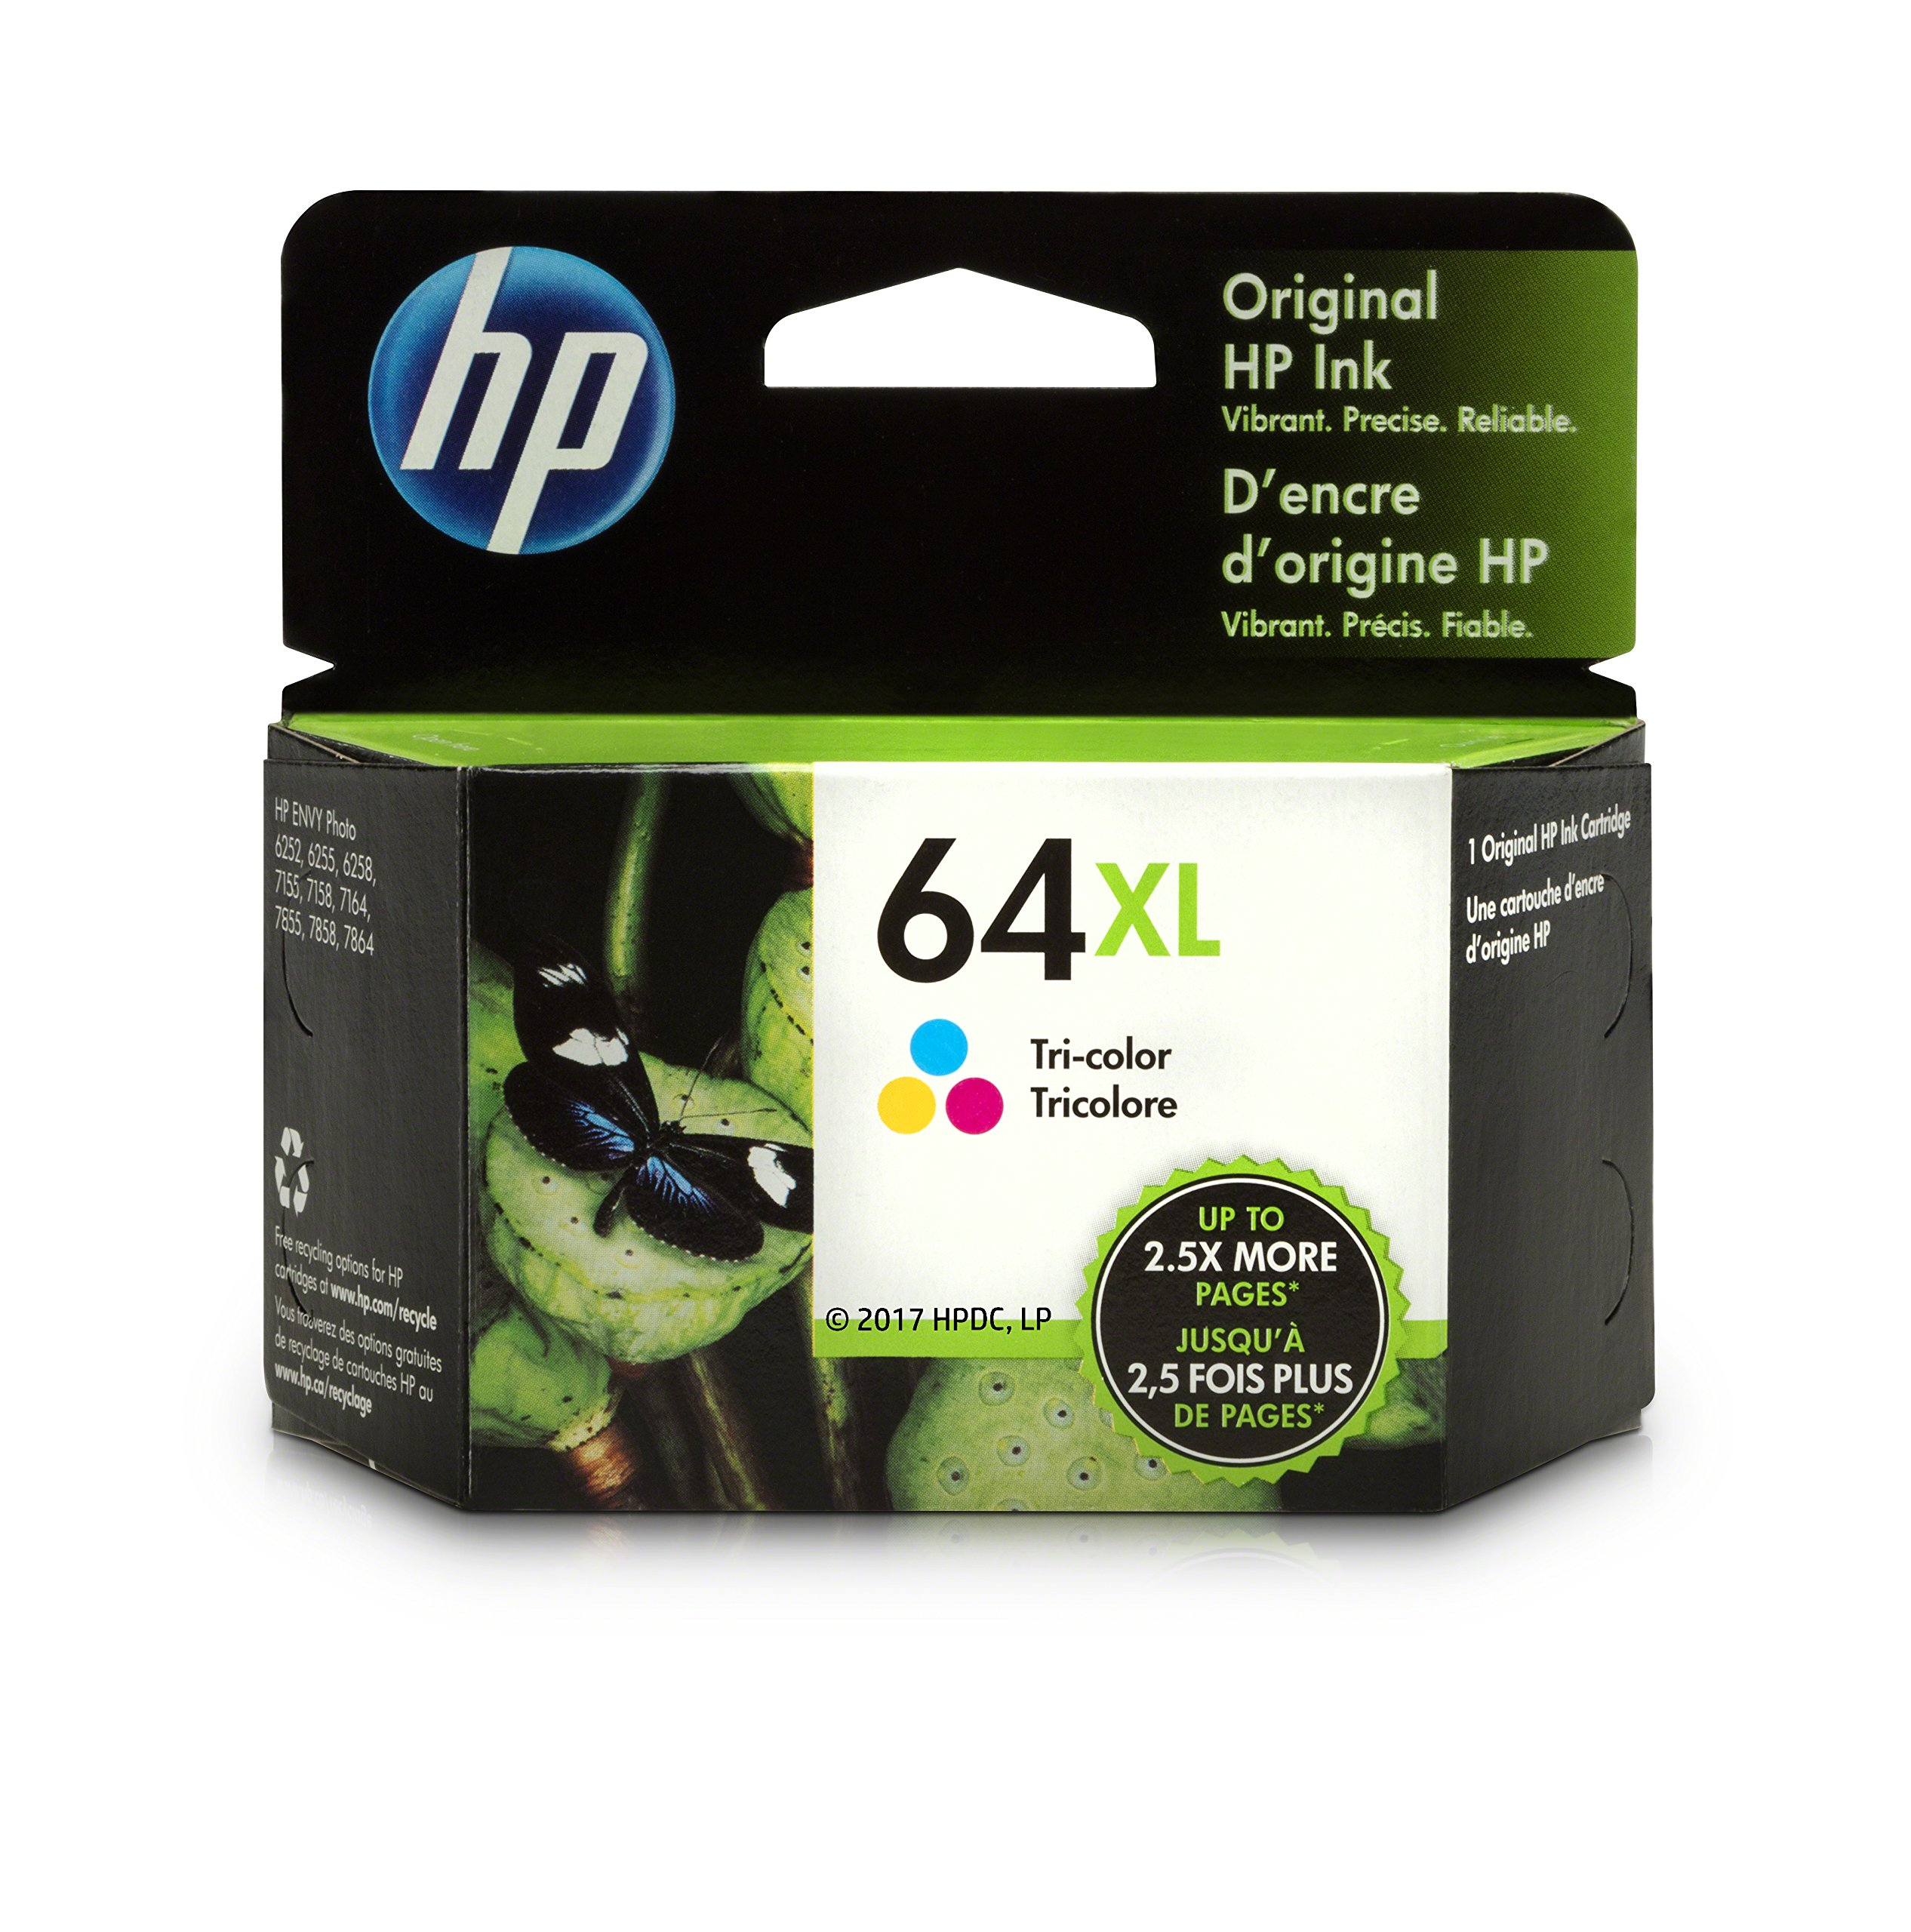 HP 64XL Tri-Color High Yield Original Ink Cartridge (N9J91AN) for HP Envy Photo 6252 6255 6258 7155 7158 7164 7855 7858 7864 HP Envy 5542